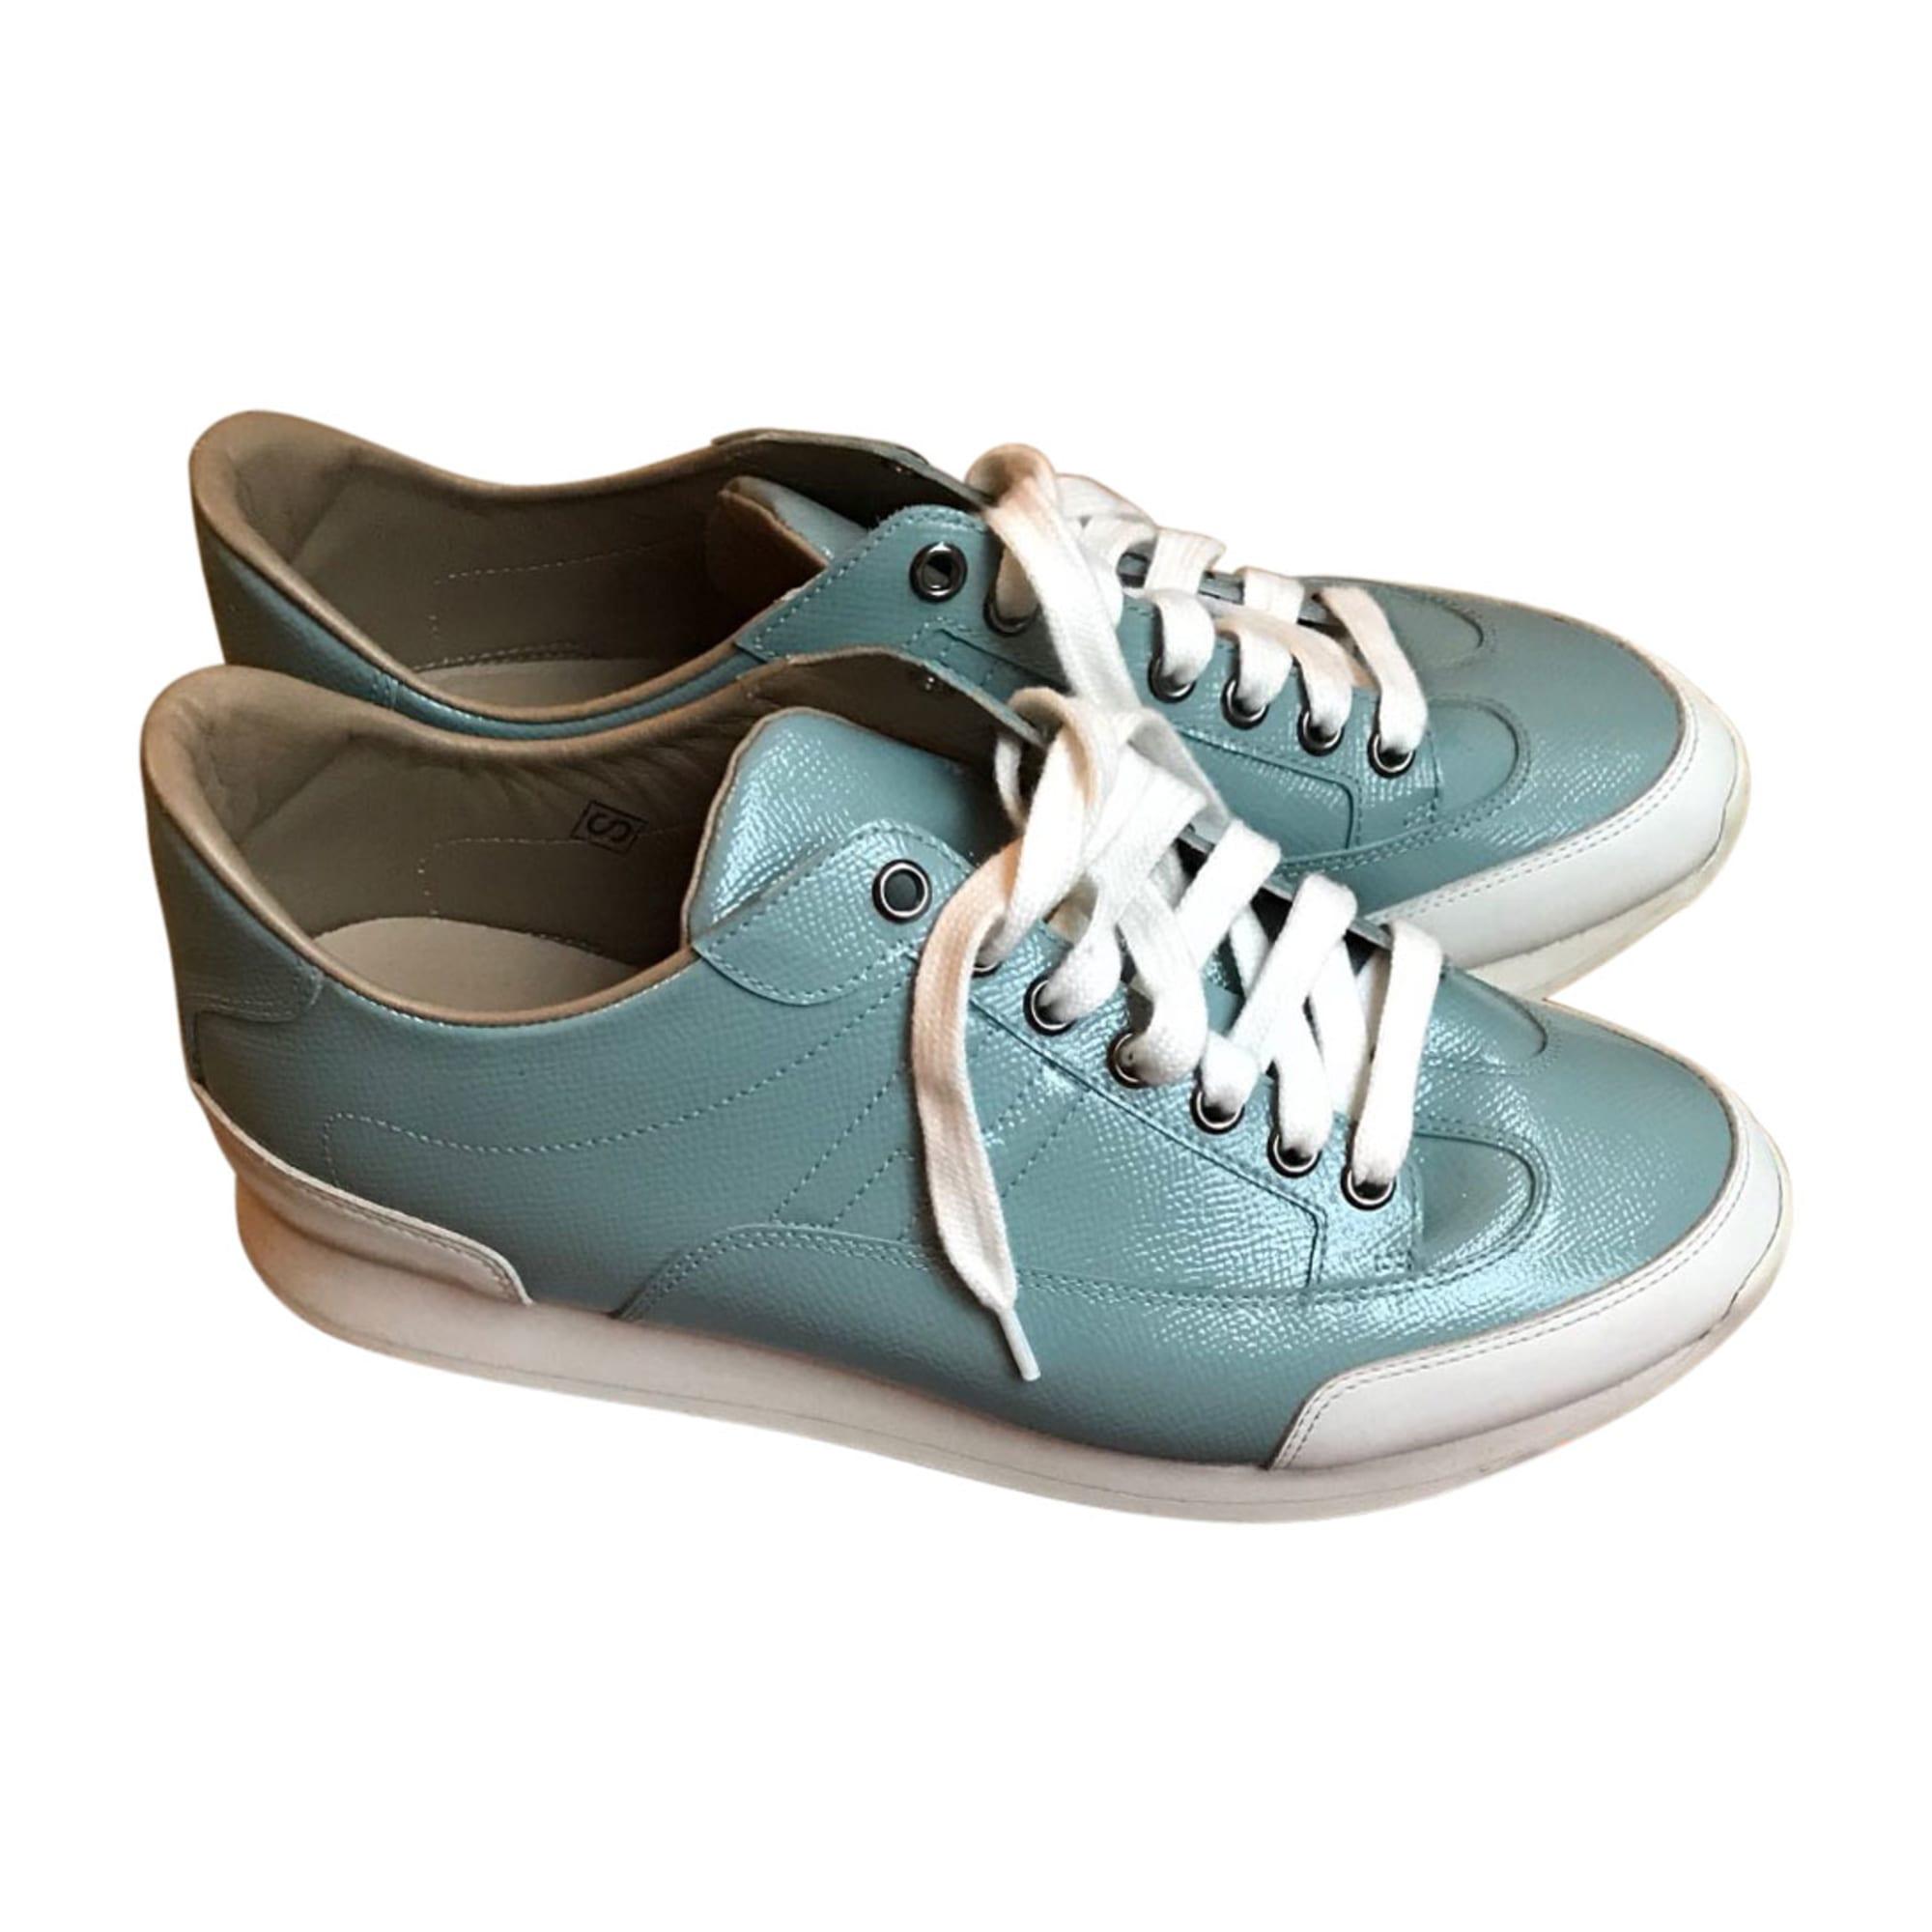 Sneakers HERMÈS Blue, navy, turquoise